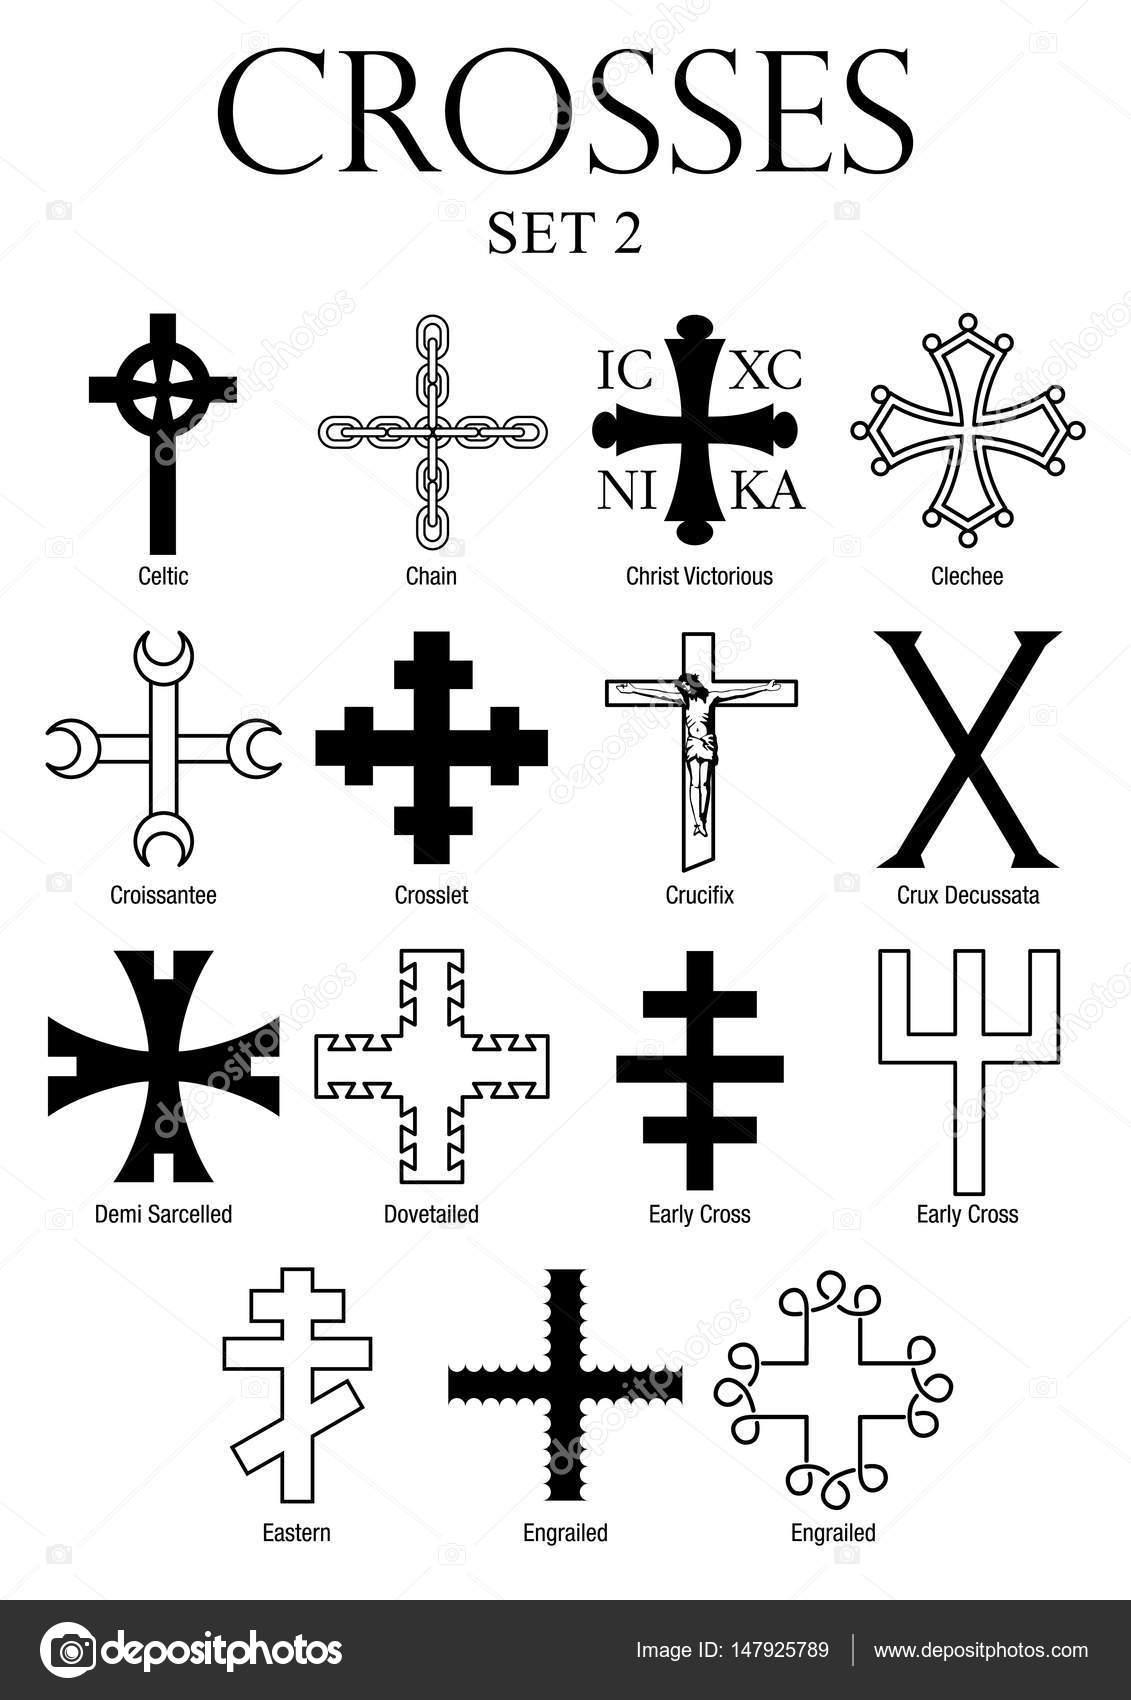 Tipos De Cruces fondo: nombres con | juego de cruces con nombres sobre fondo blanco